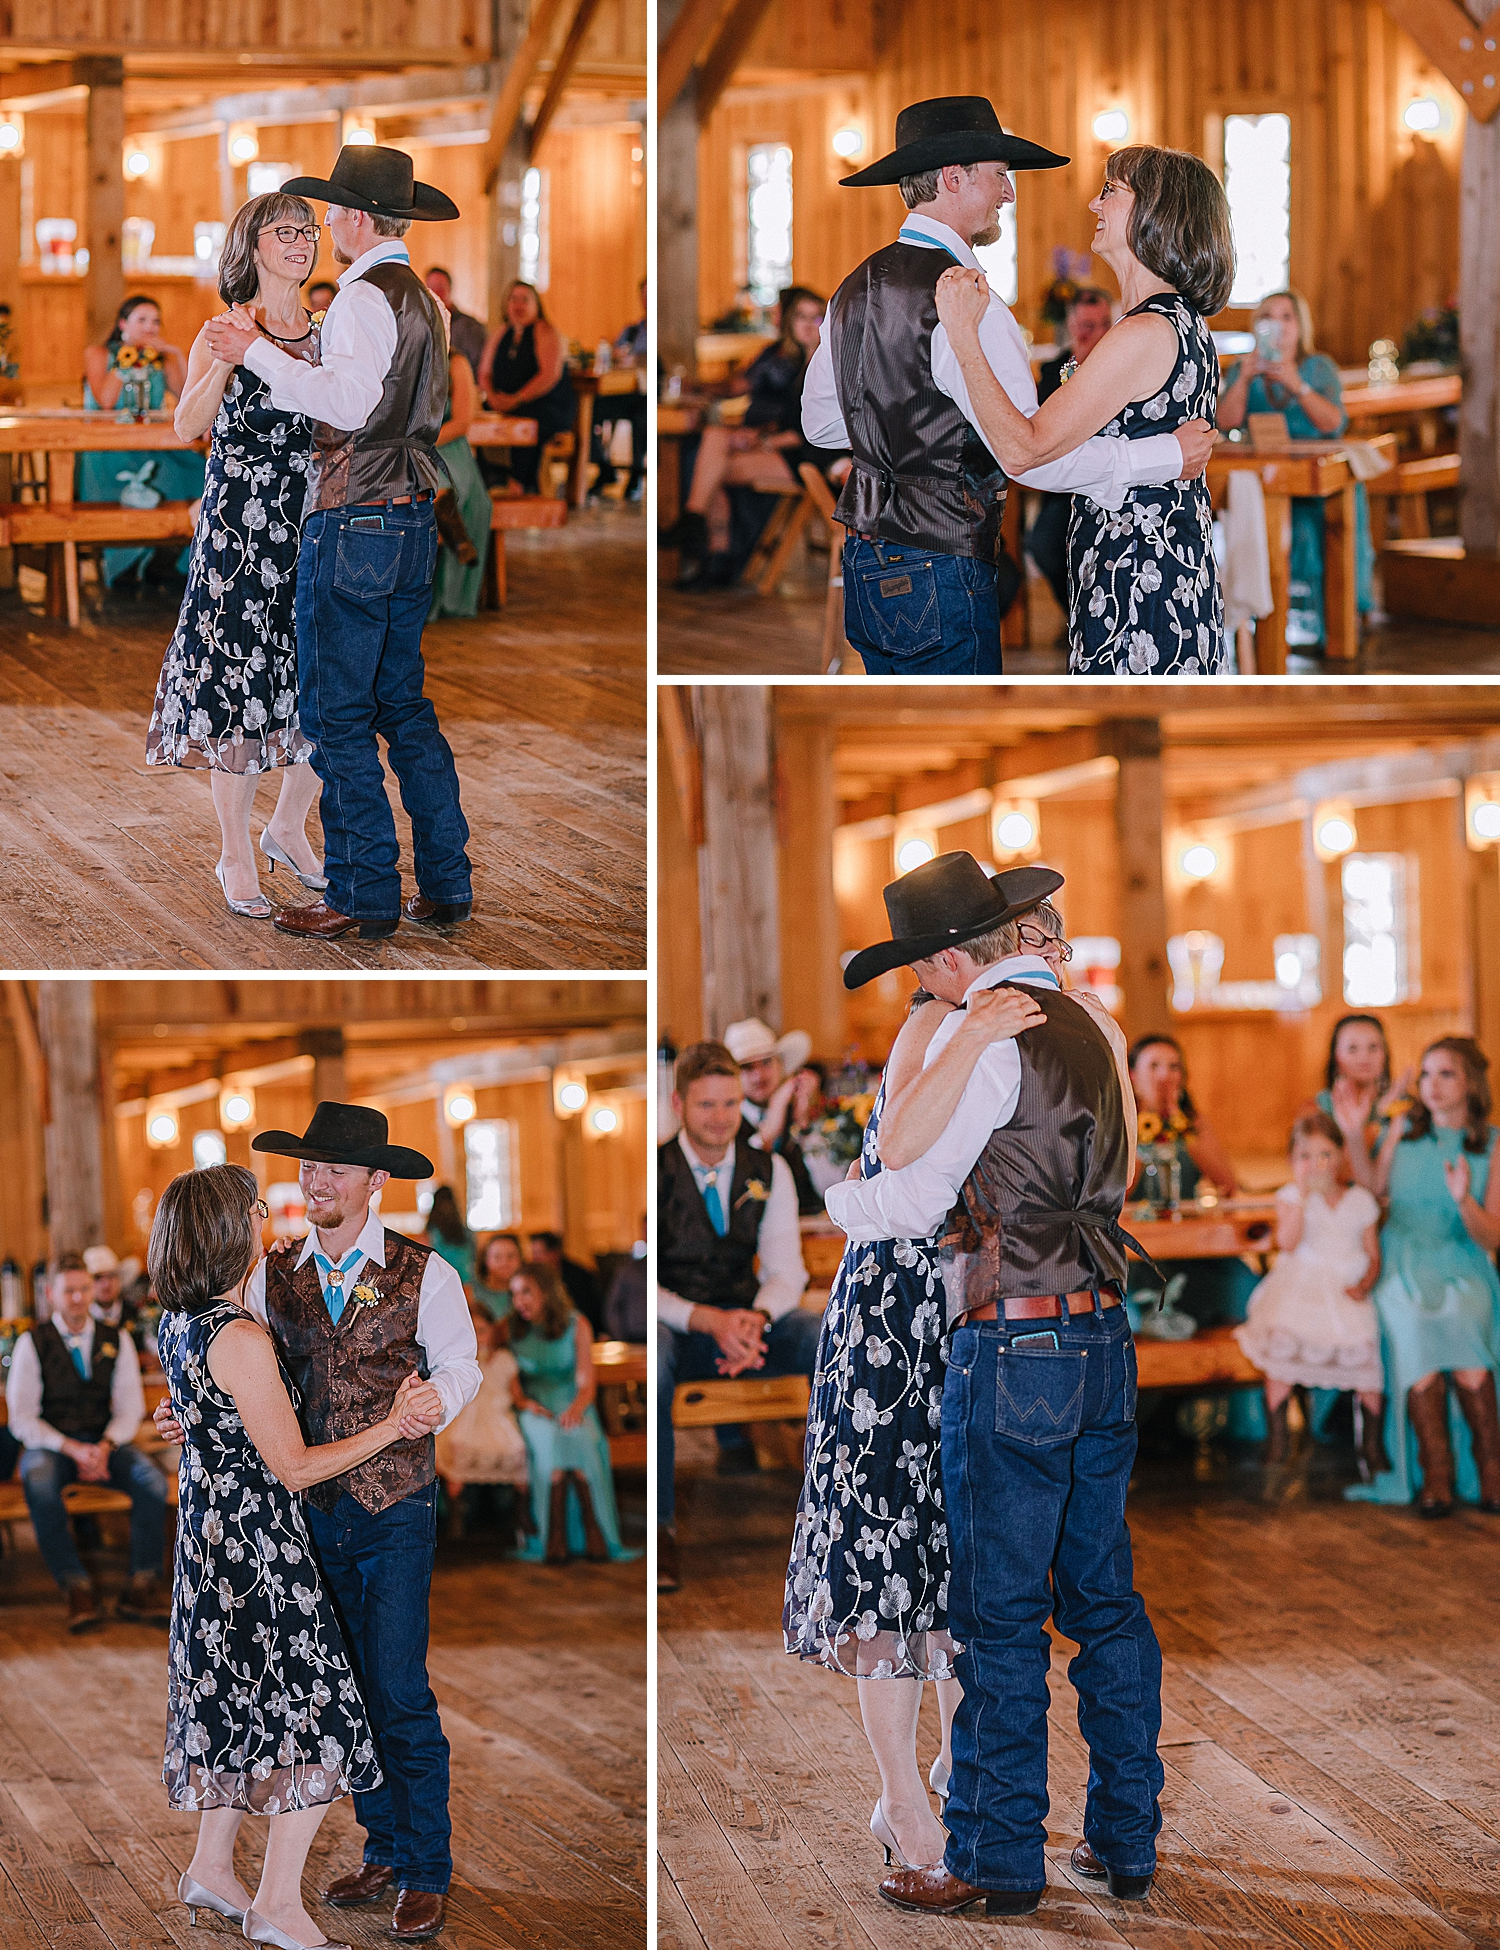 Carly-Barton-Photography-Old-Town-Texas-Rustic-Wedding-Photos-Sunflowers-Boots-Kyle-Texas_0088.jpg